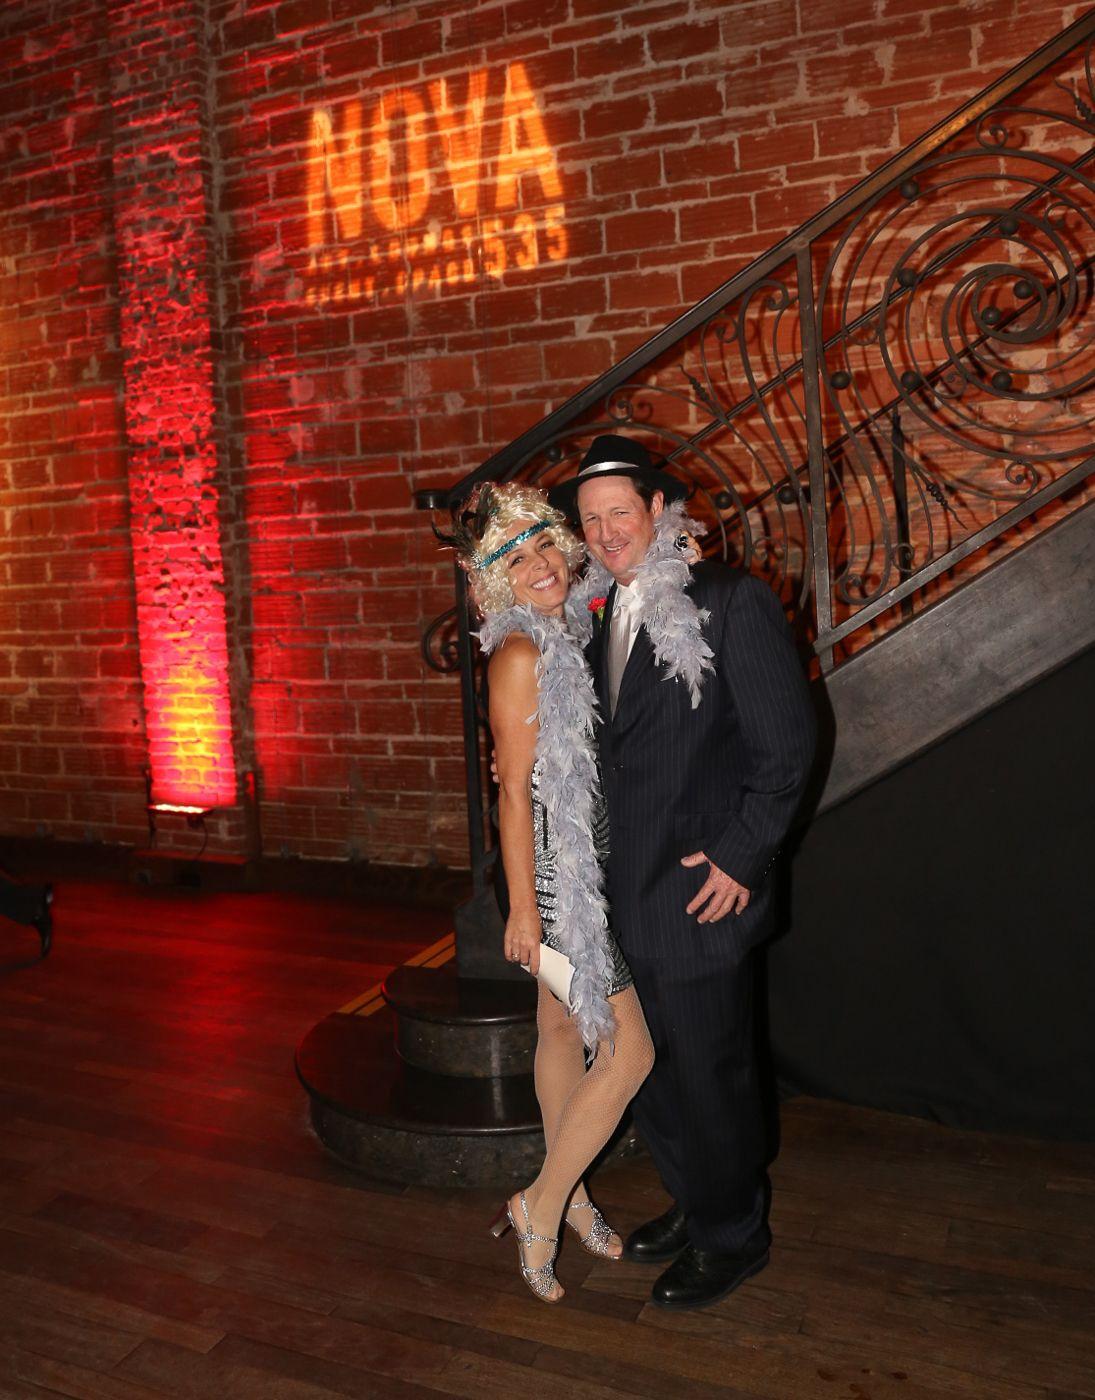 2015 11-28 Olsen-20th-Anniversary-Party-at-venue-NOVA-535-downtown-StPete-DTSP-89